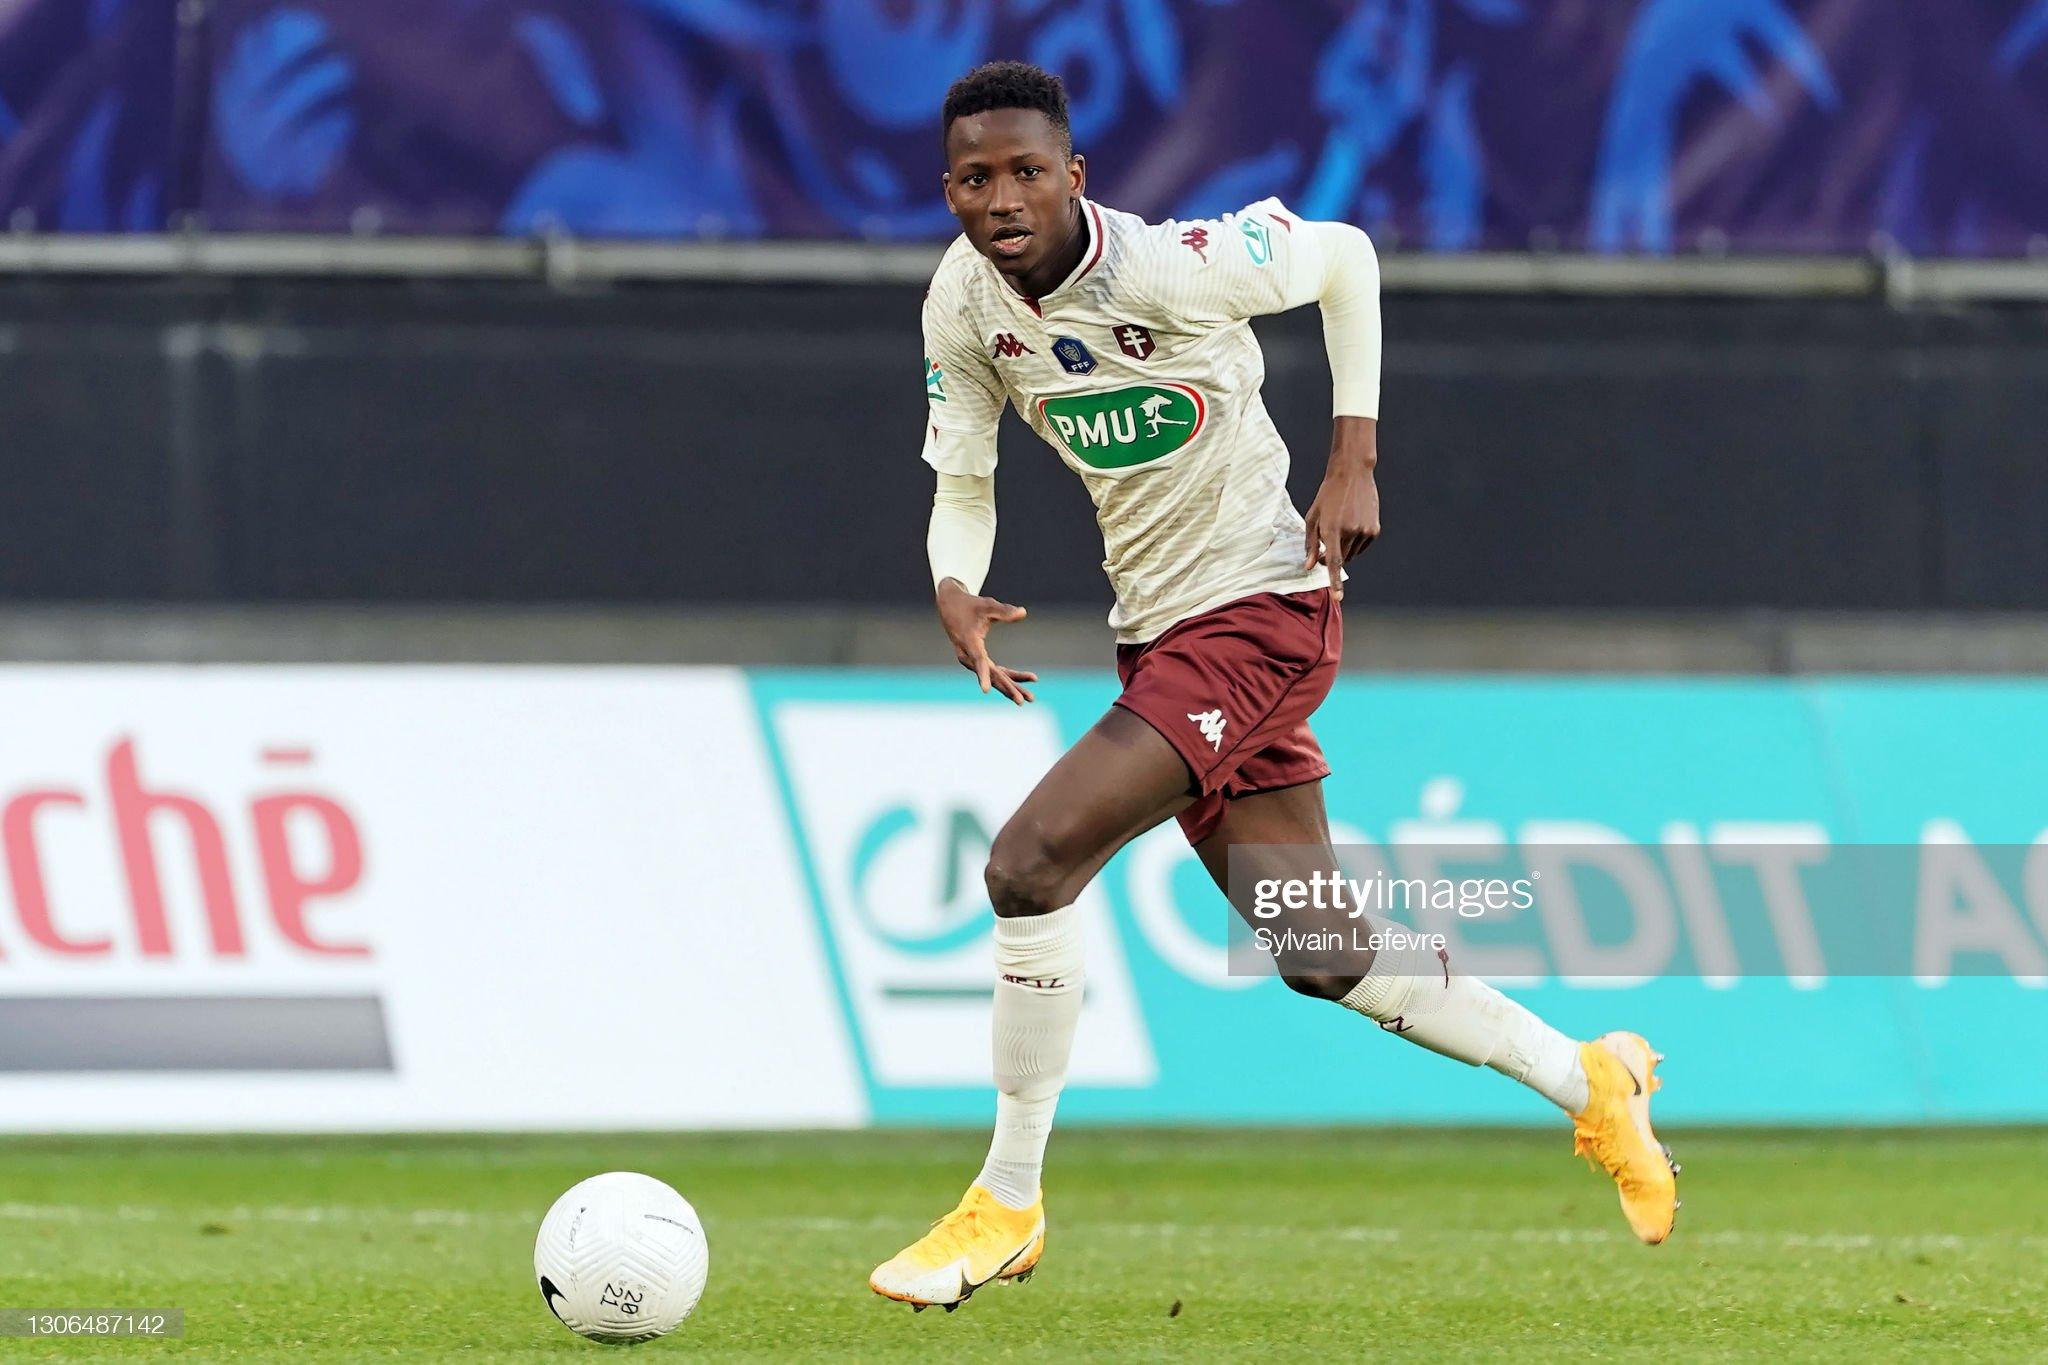 Valenciennes FC vs Metz FC - Coupe de France, Round of 32 : ニュース写真